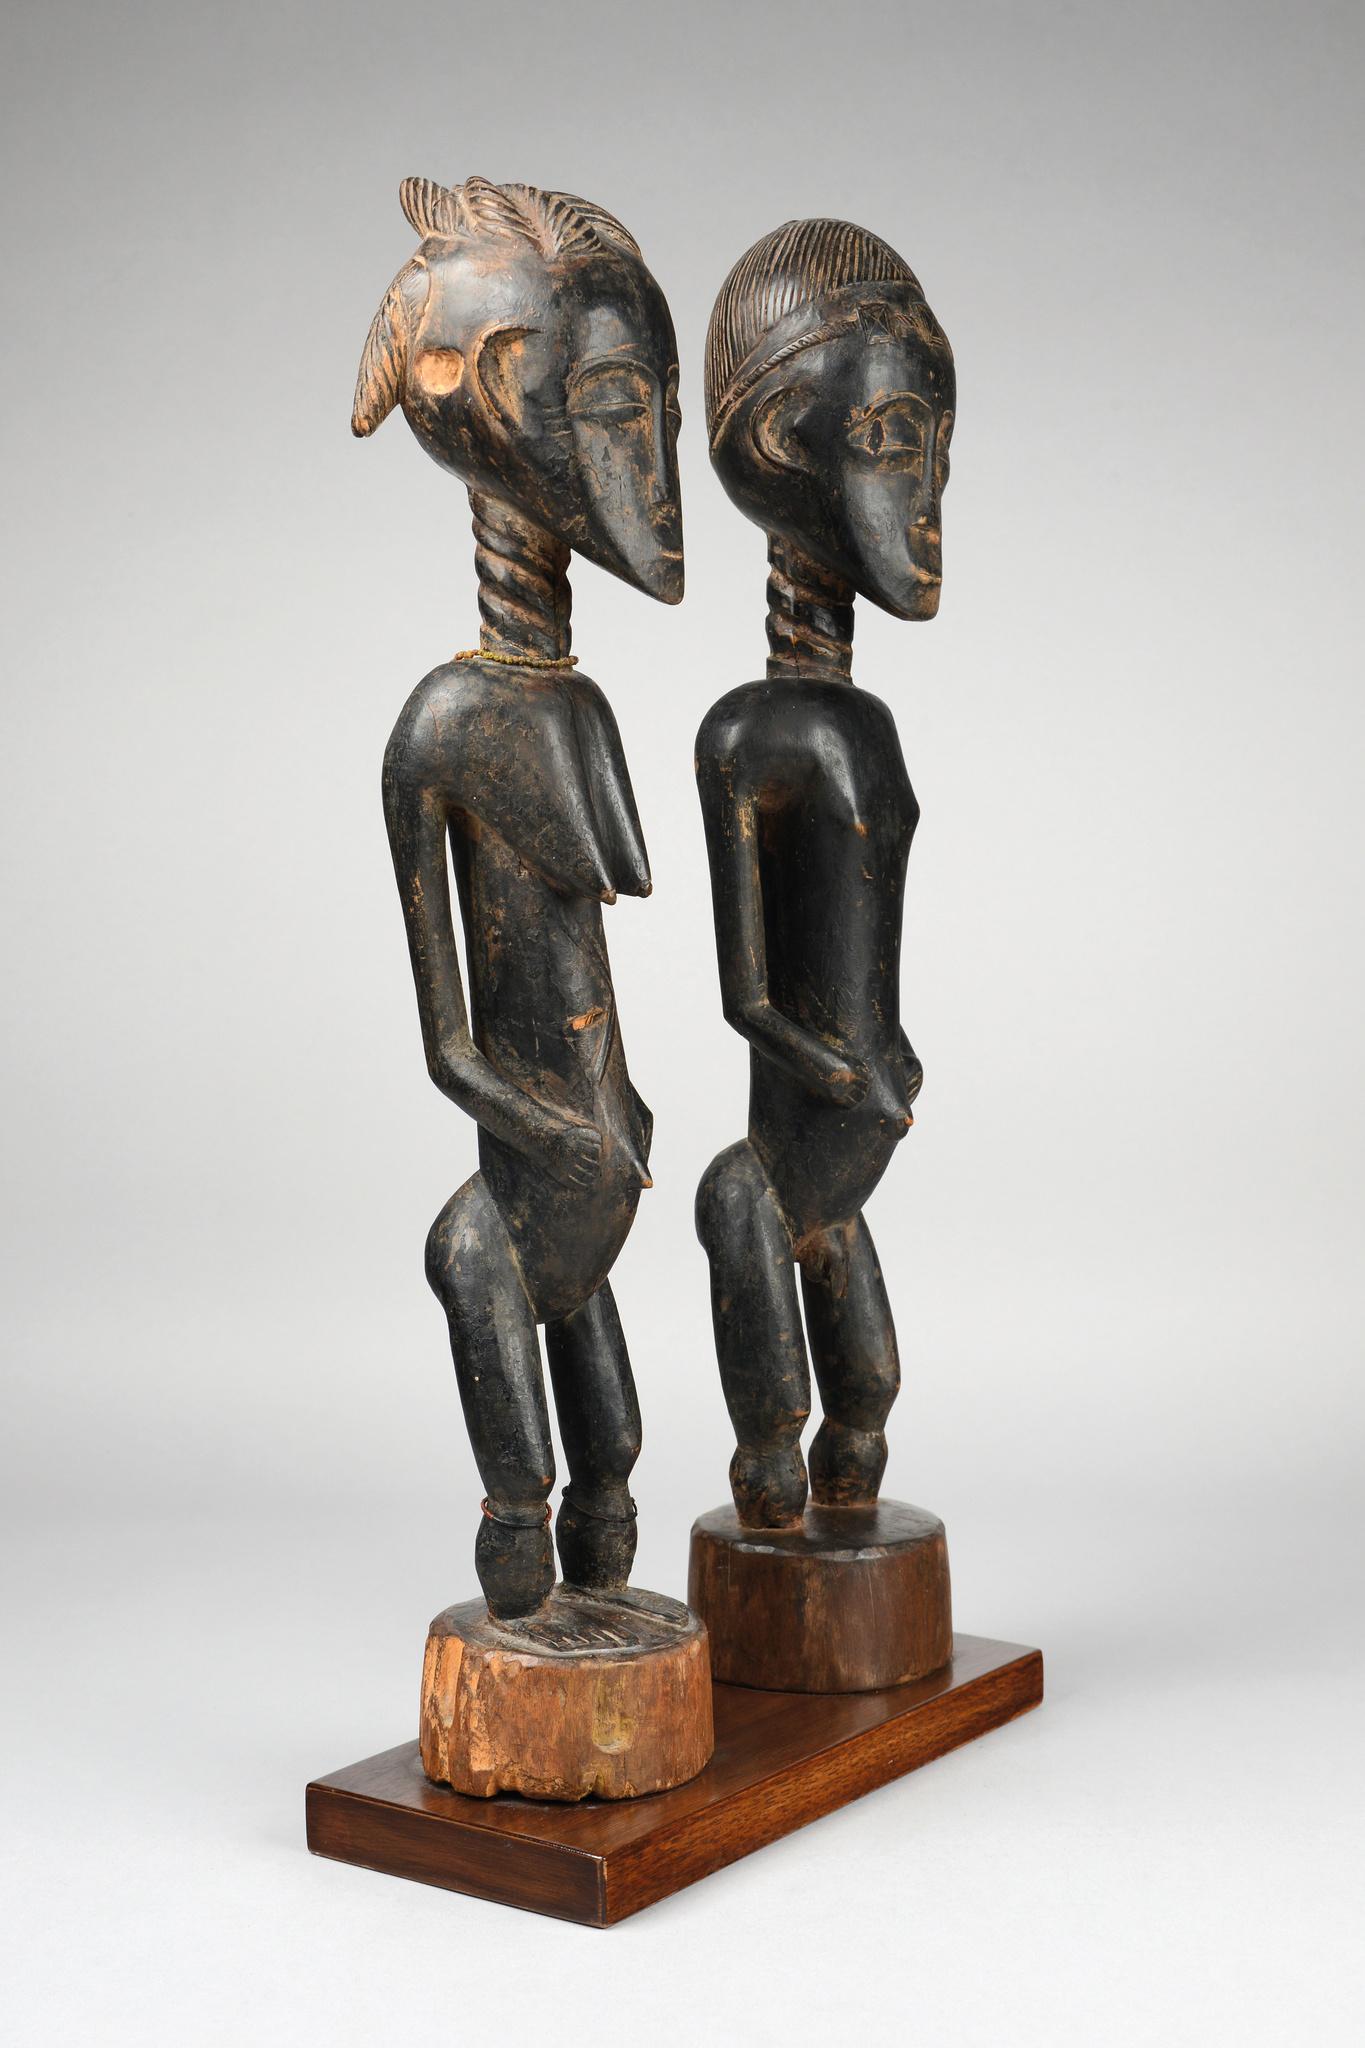 Very rare pair of ancestor figures